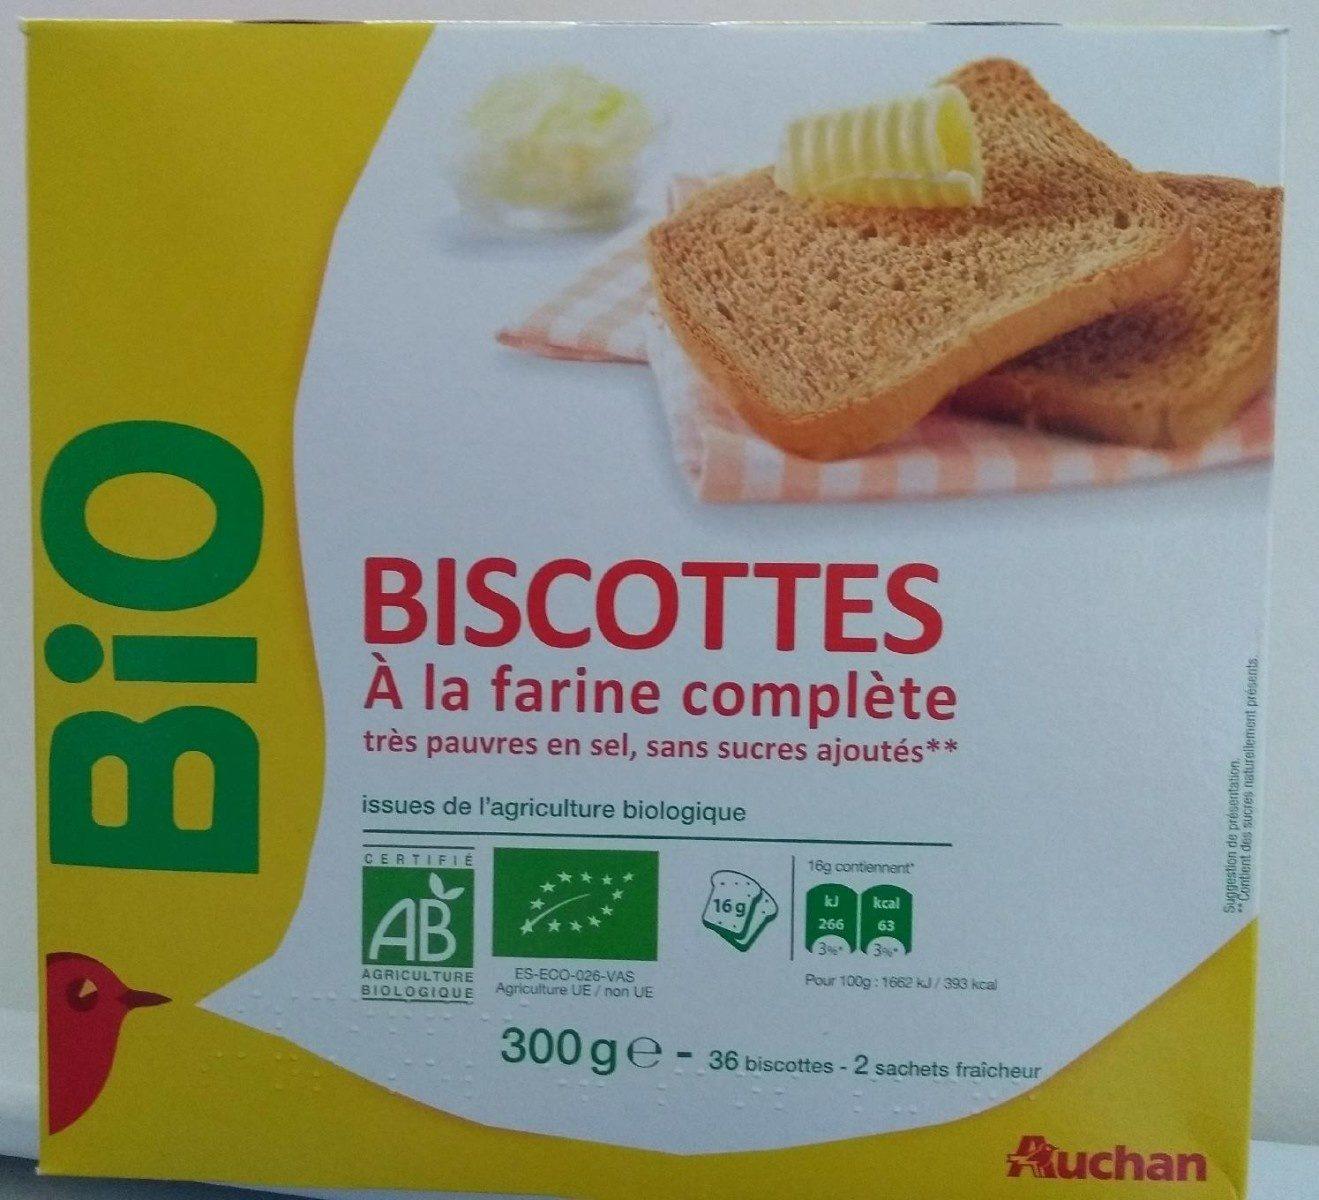 Biscottes a la farine complète - Product